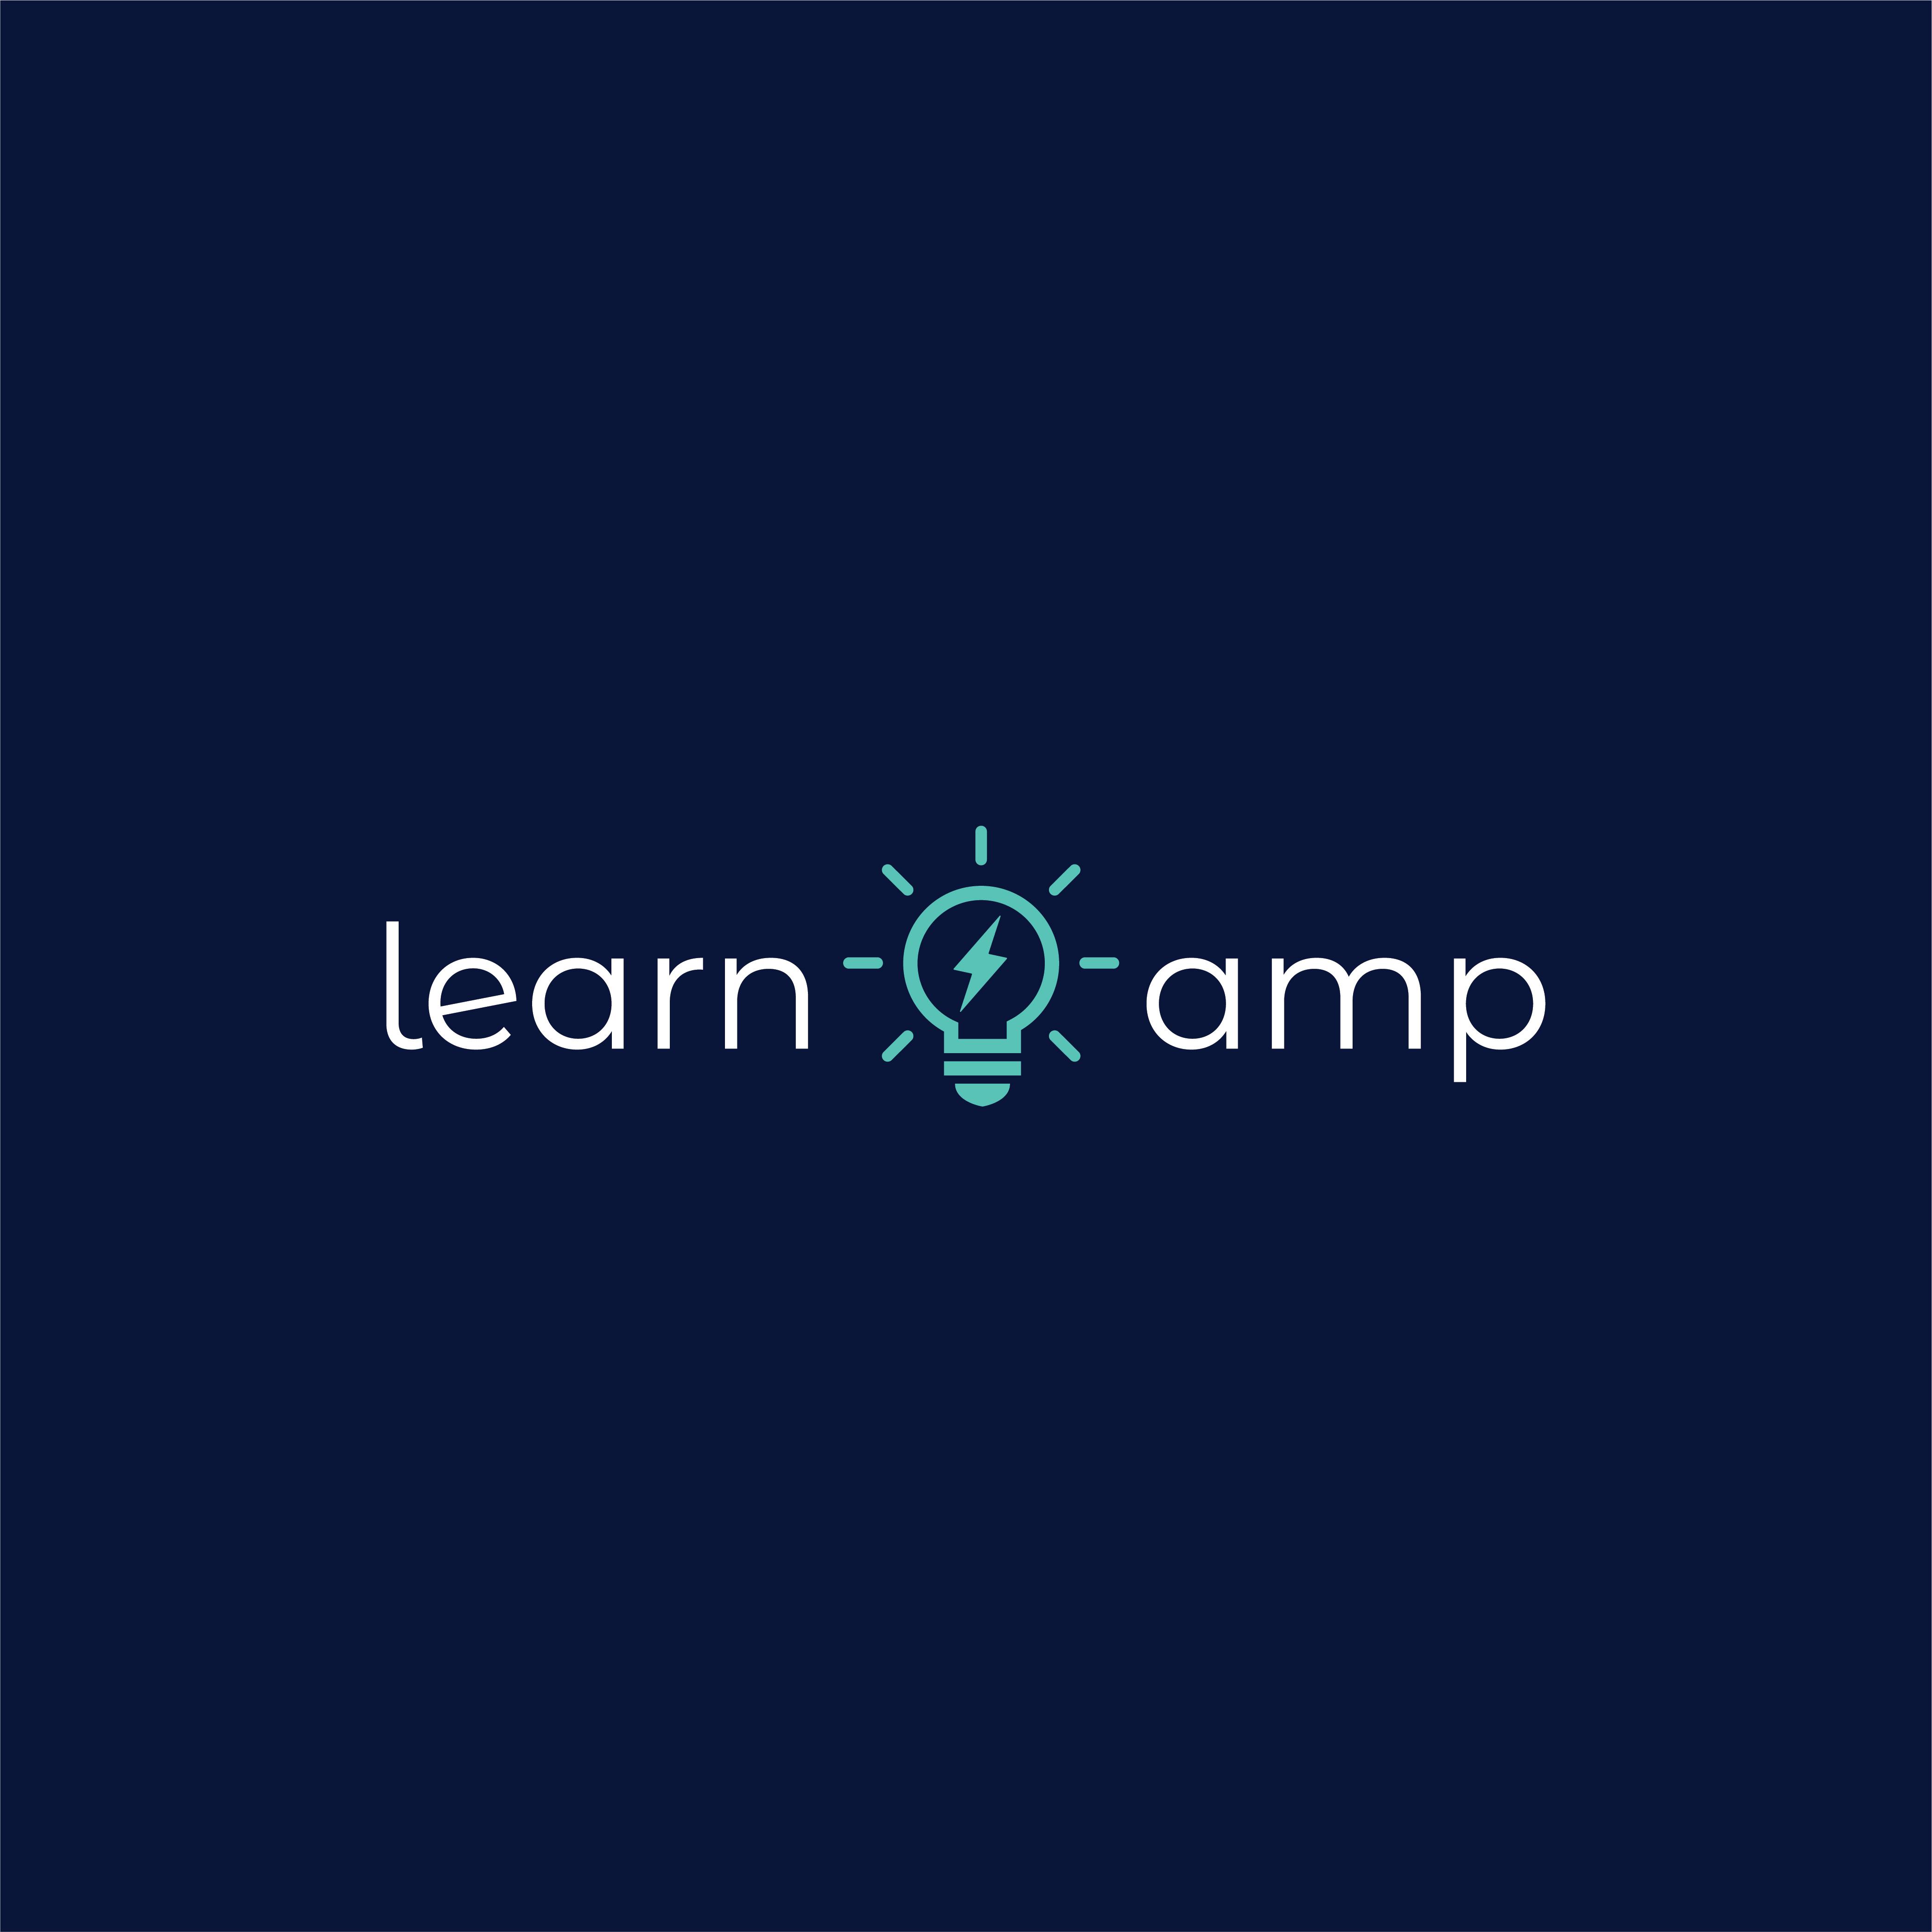 Learn Amp Logo-1